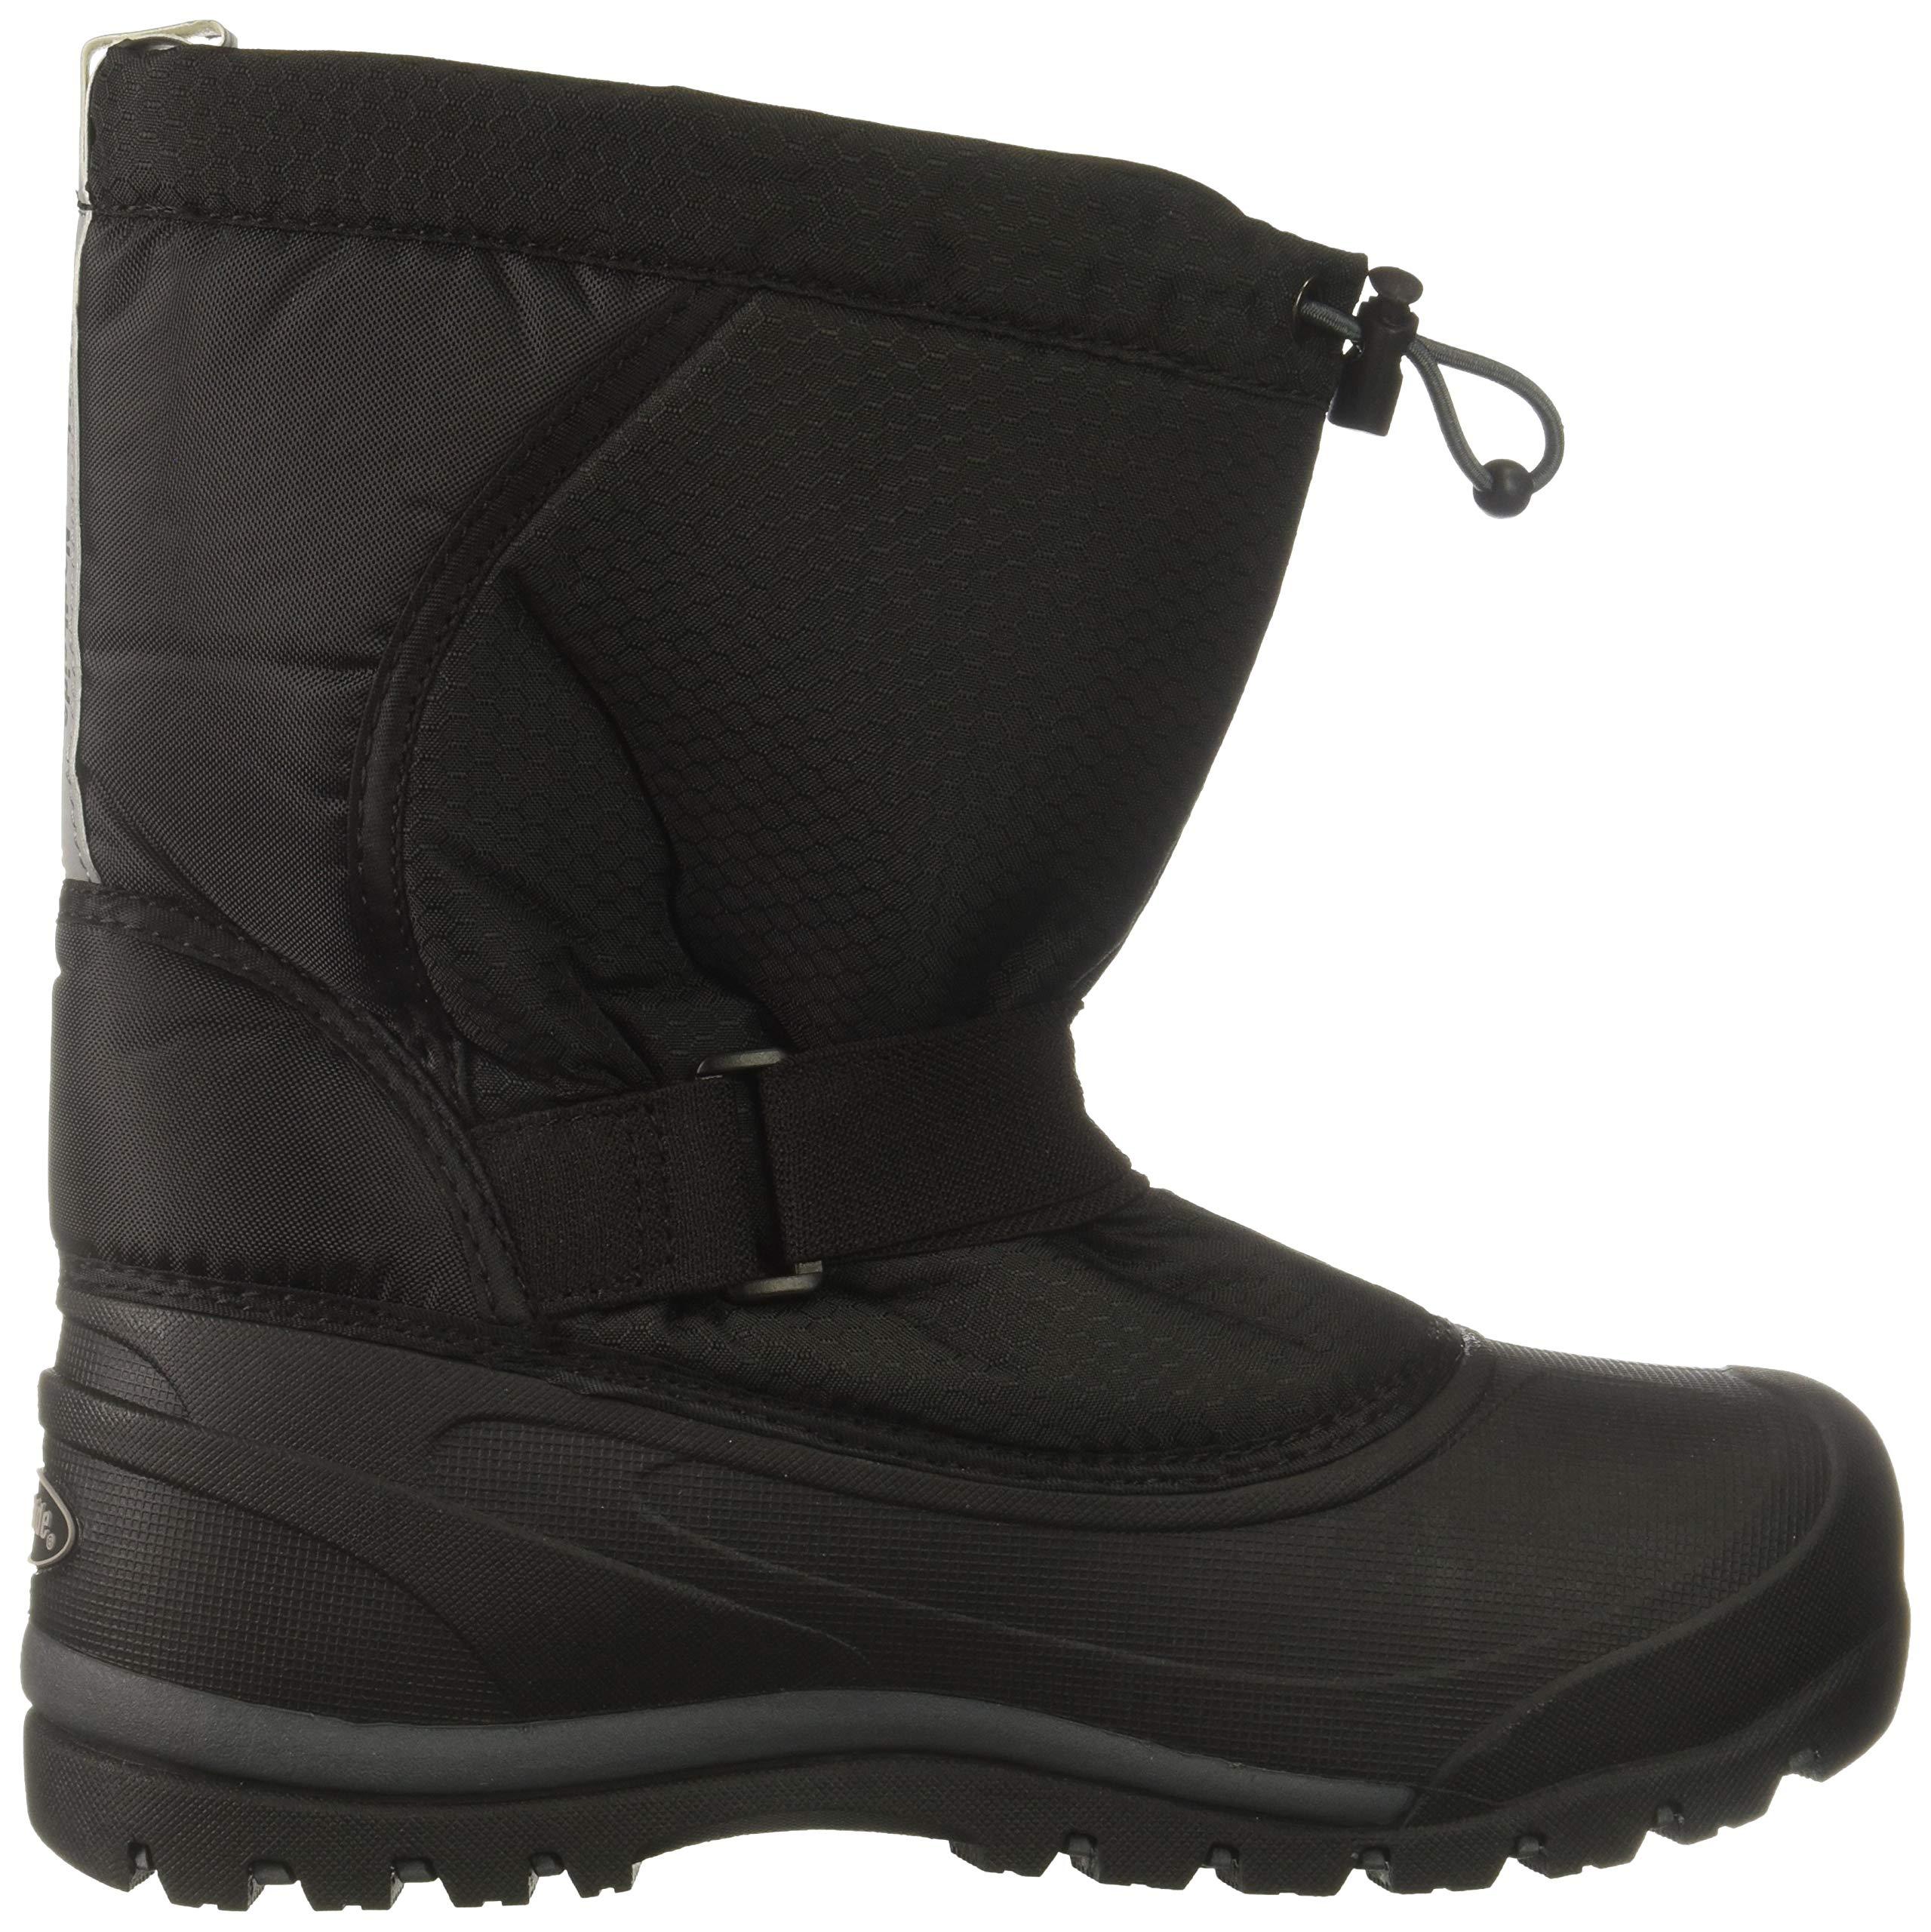 Northside Zephyr Snow Boot, Onyx, 6 Medium US Big Kid by Northside (Image #6)